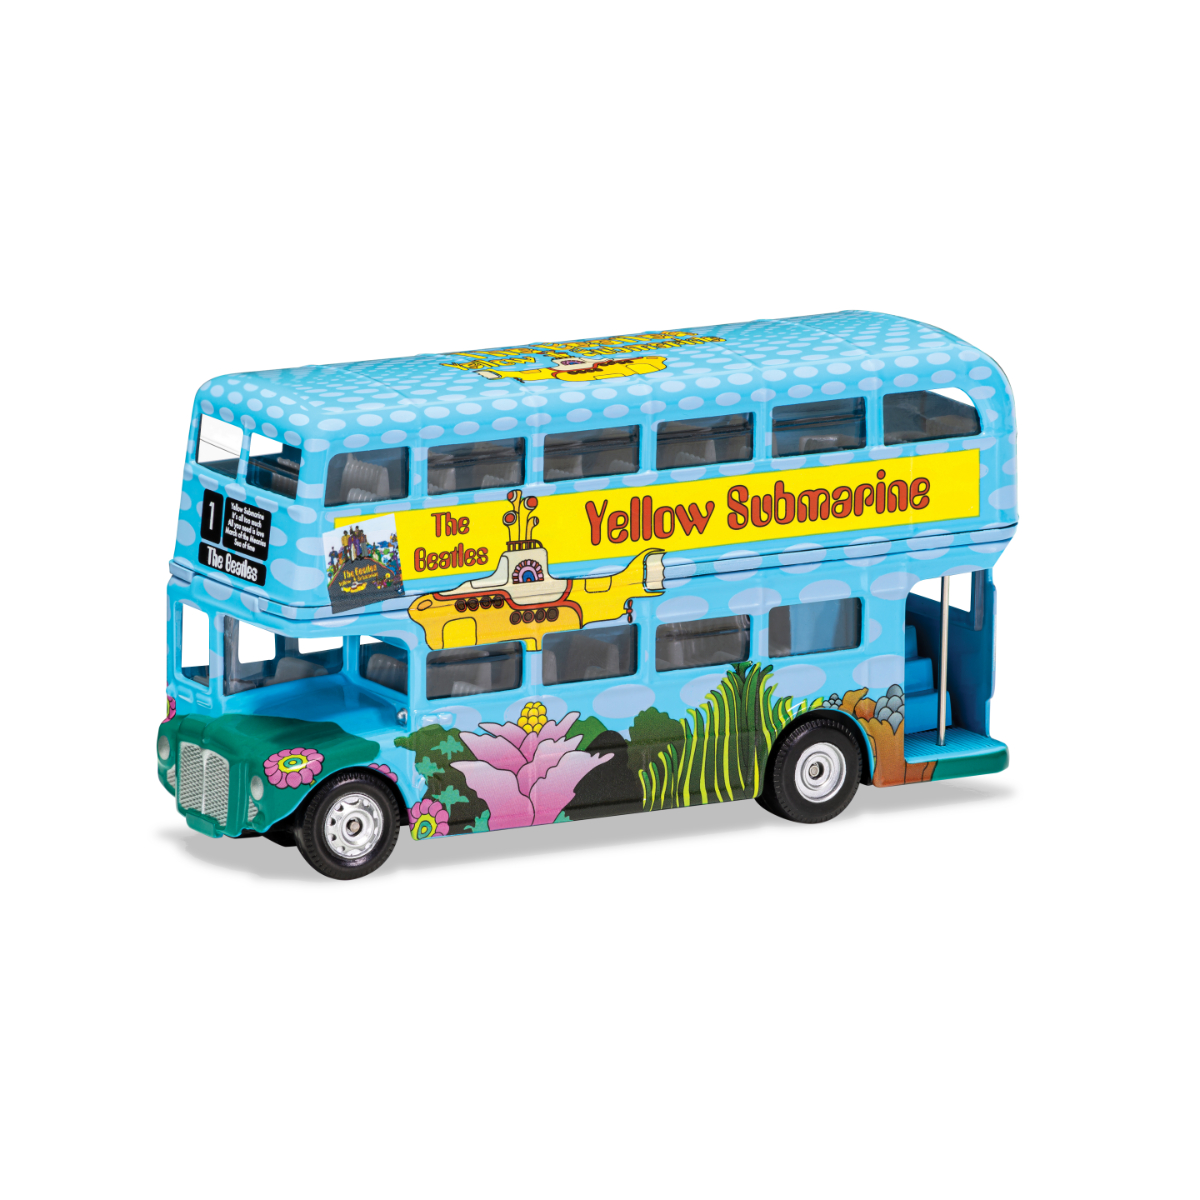 Hornby Yellow Submarine London Bus